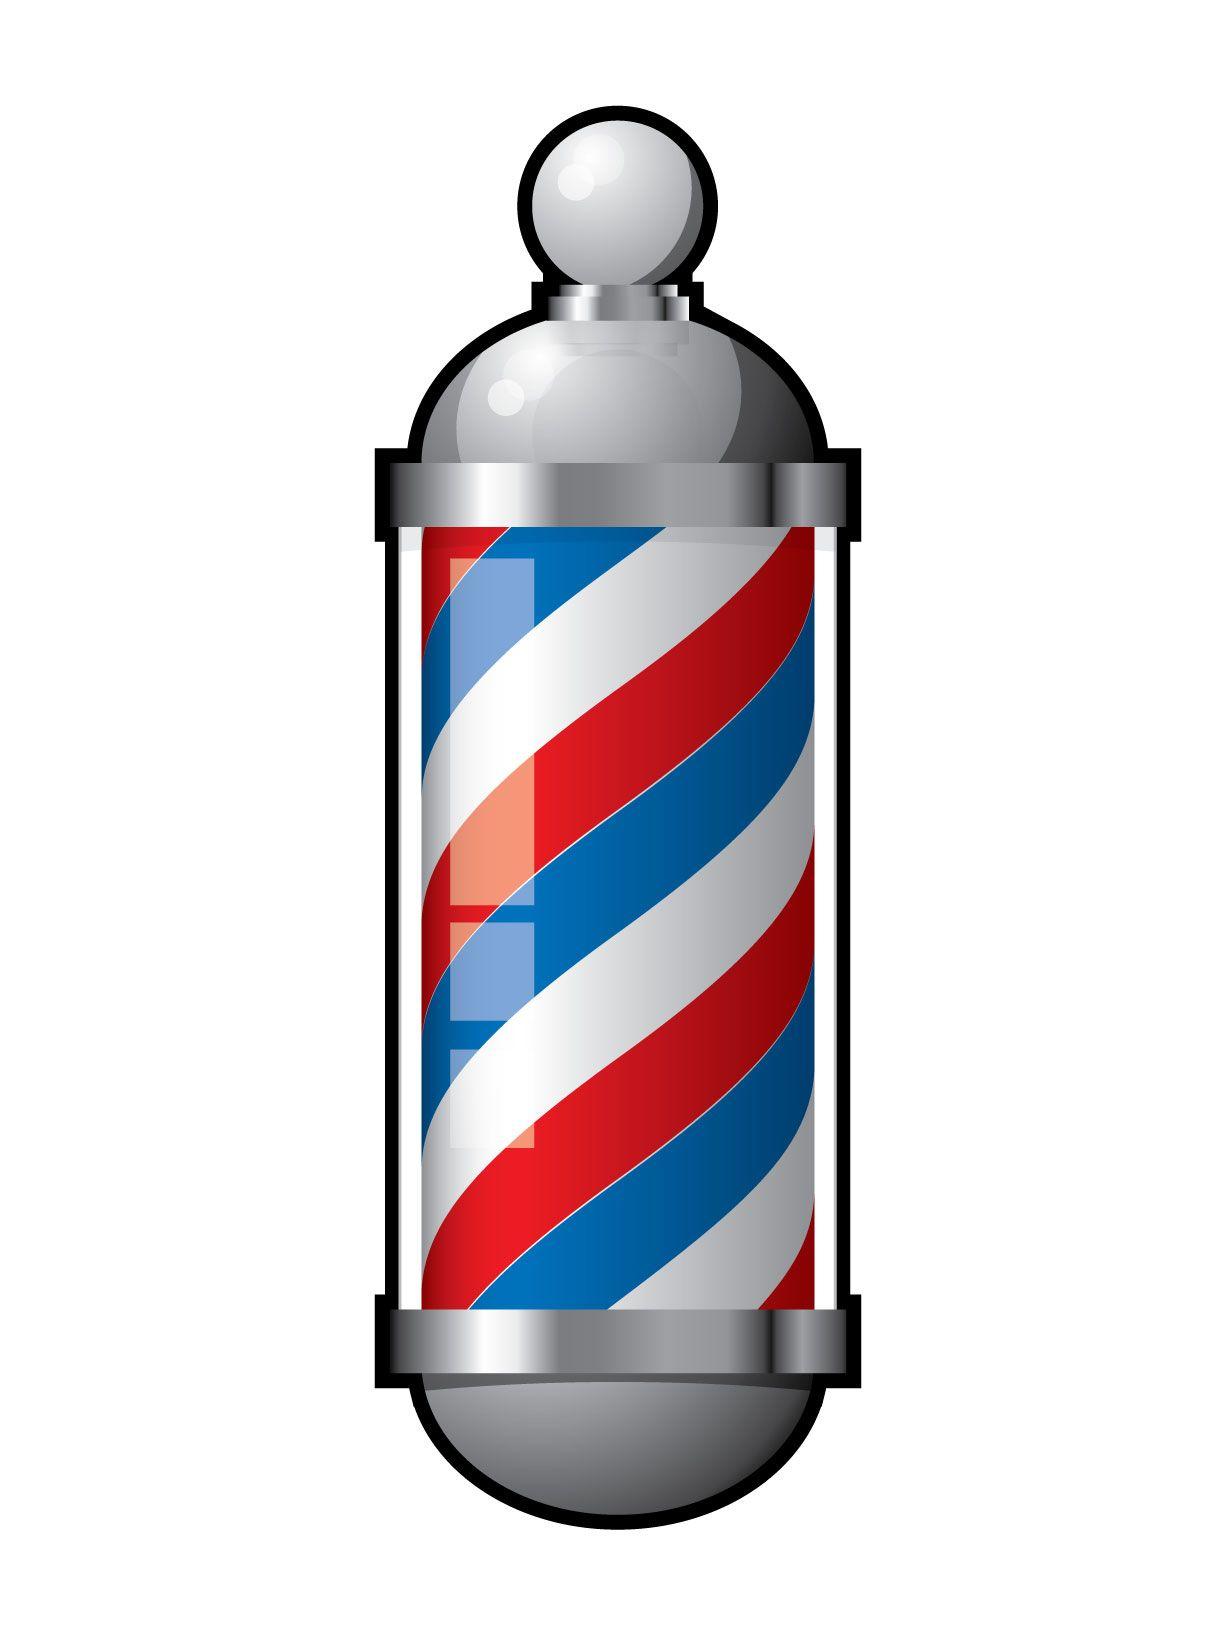 Barber Pole Drawing Poste De Barbearia Ideias Para Barbearias Logo De Barbearia